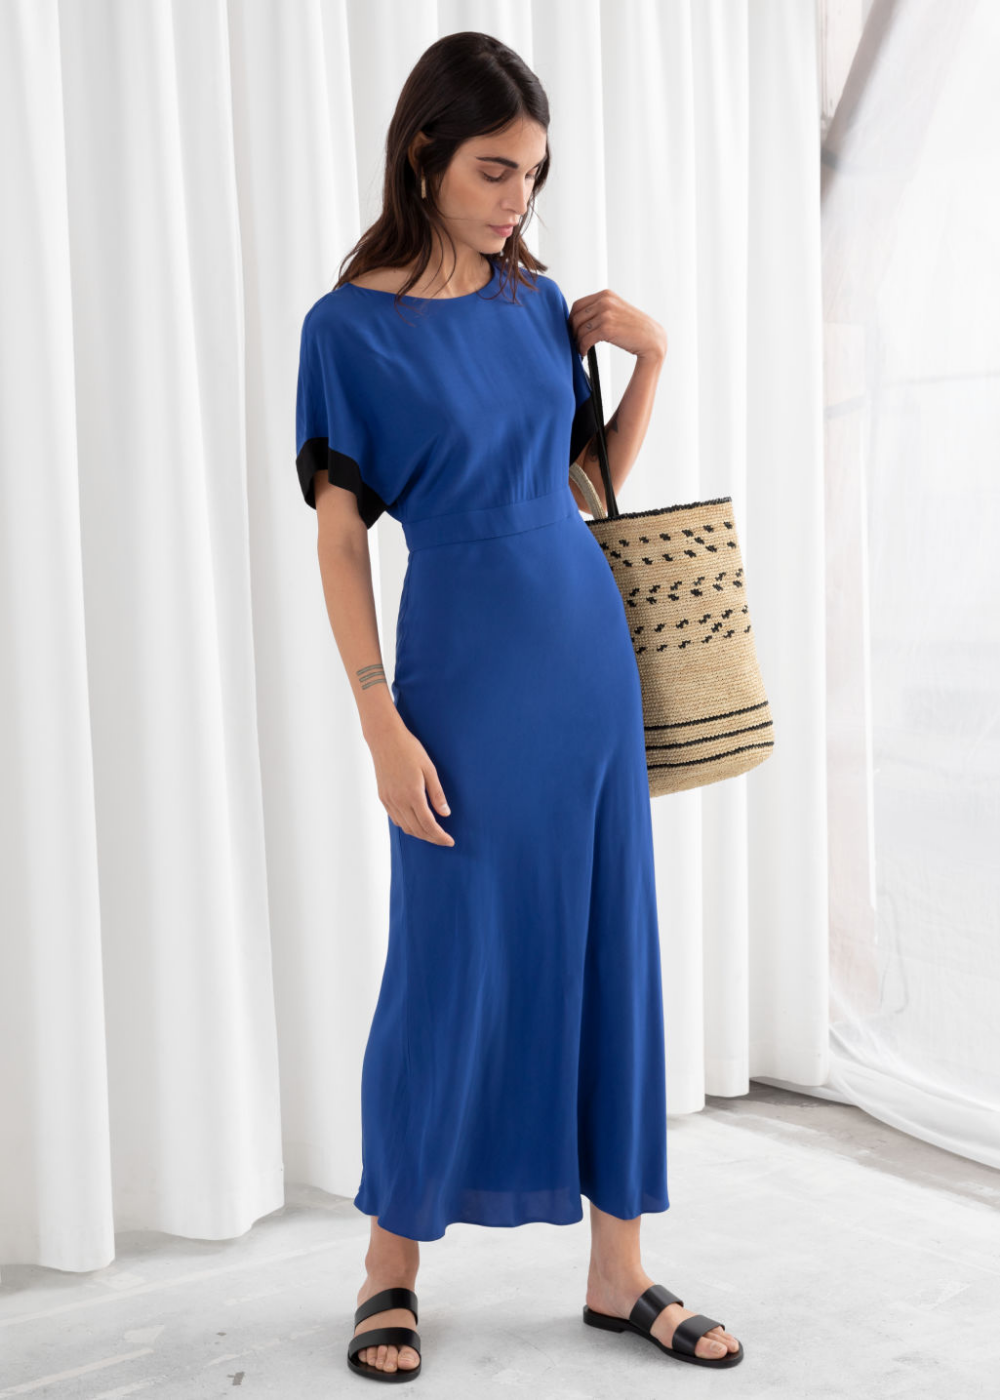 Pdp Maxi Dress With Sleeves Maxi Dress Short Sleeve Maxi Dresses [ 1400 x 1000 Pixel ]